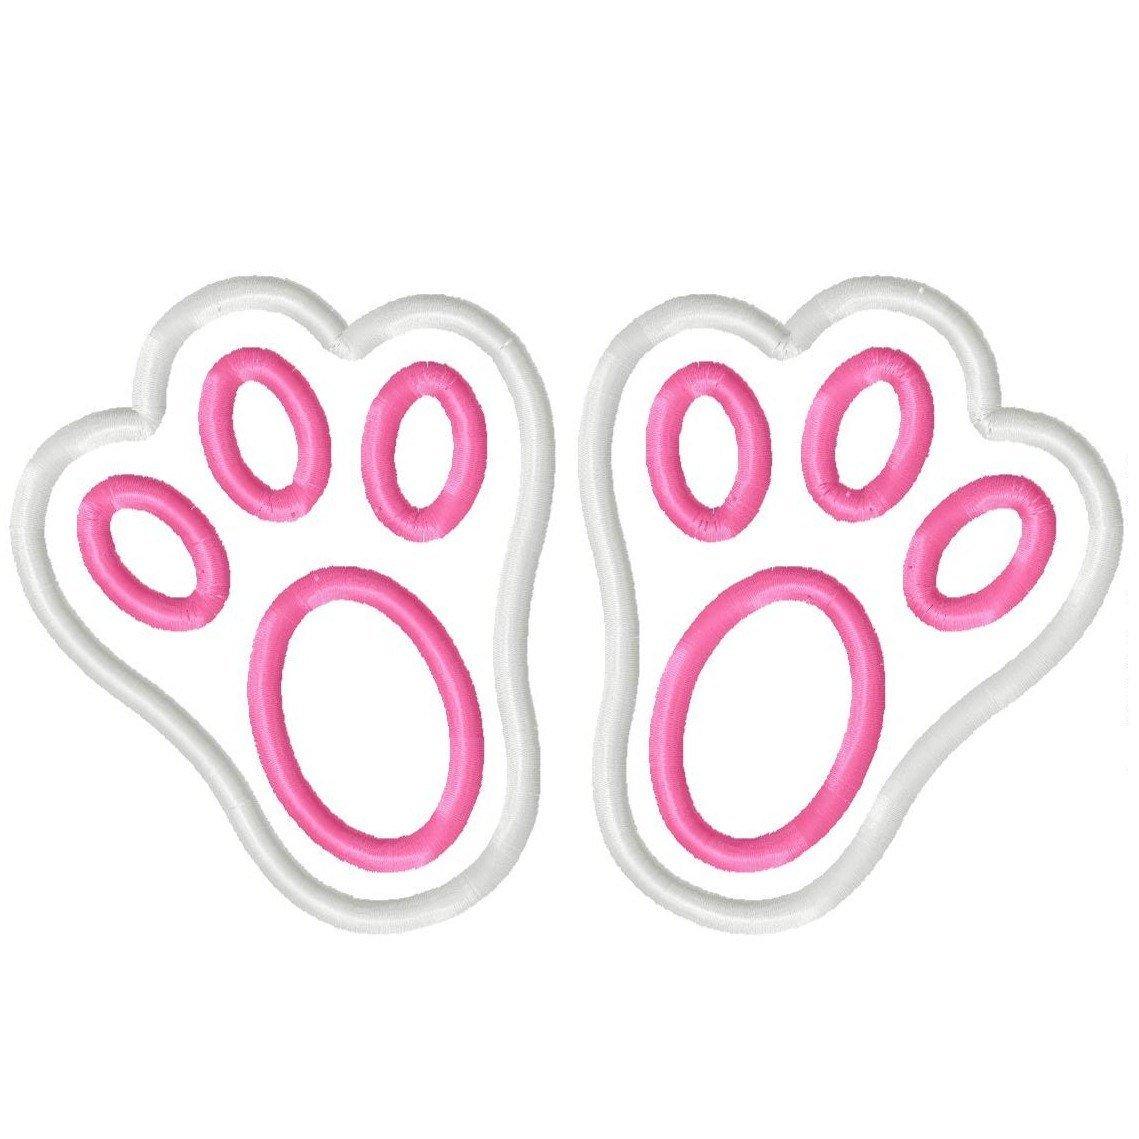 Rabbit feet clipart 2 » Clipart Portal.